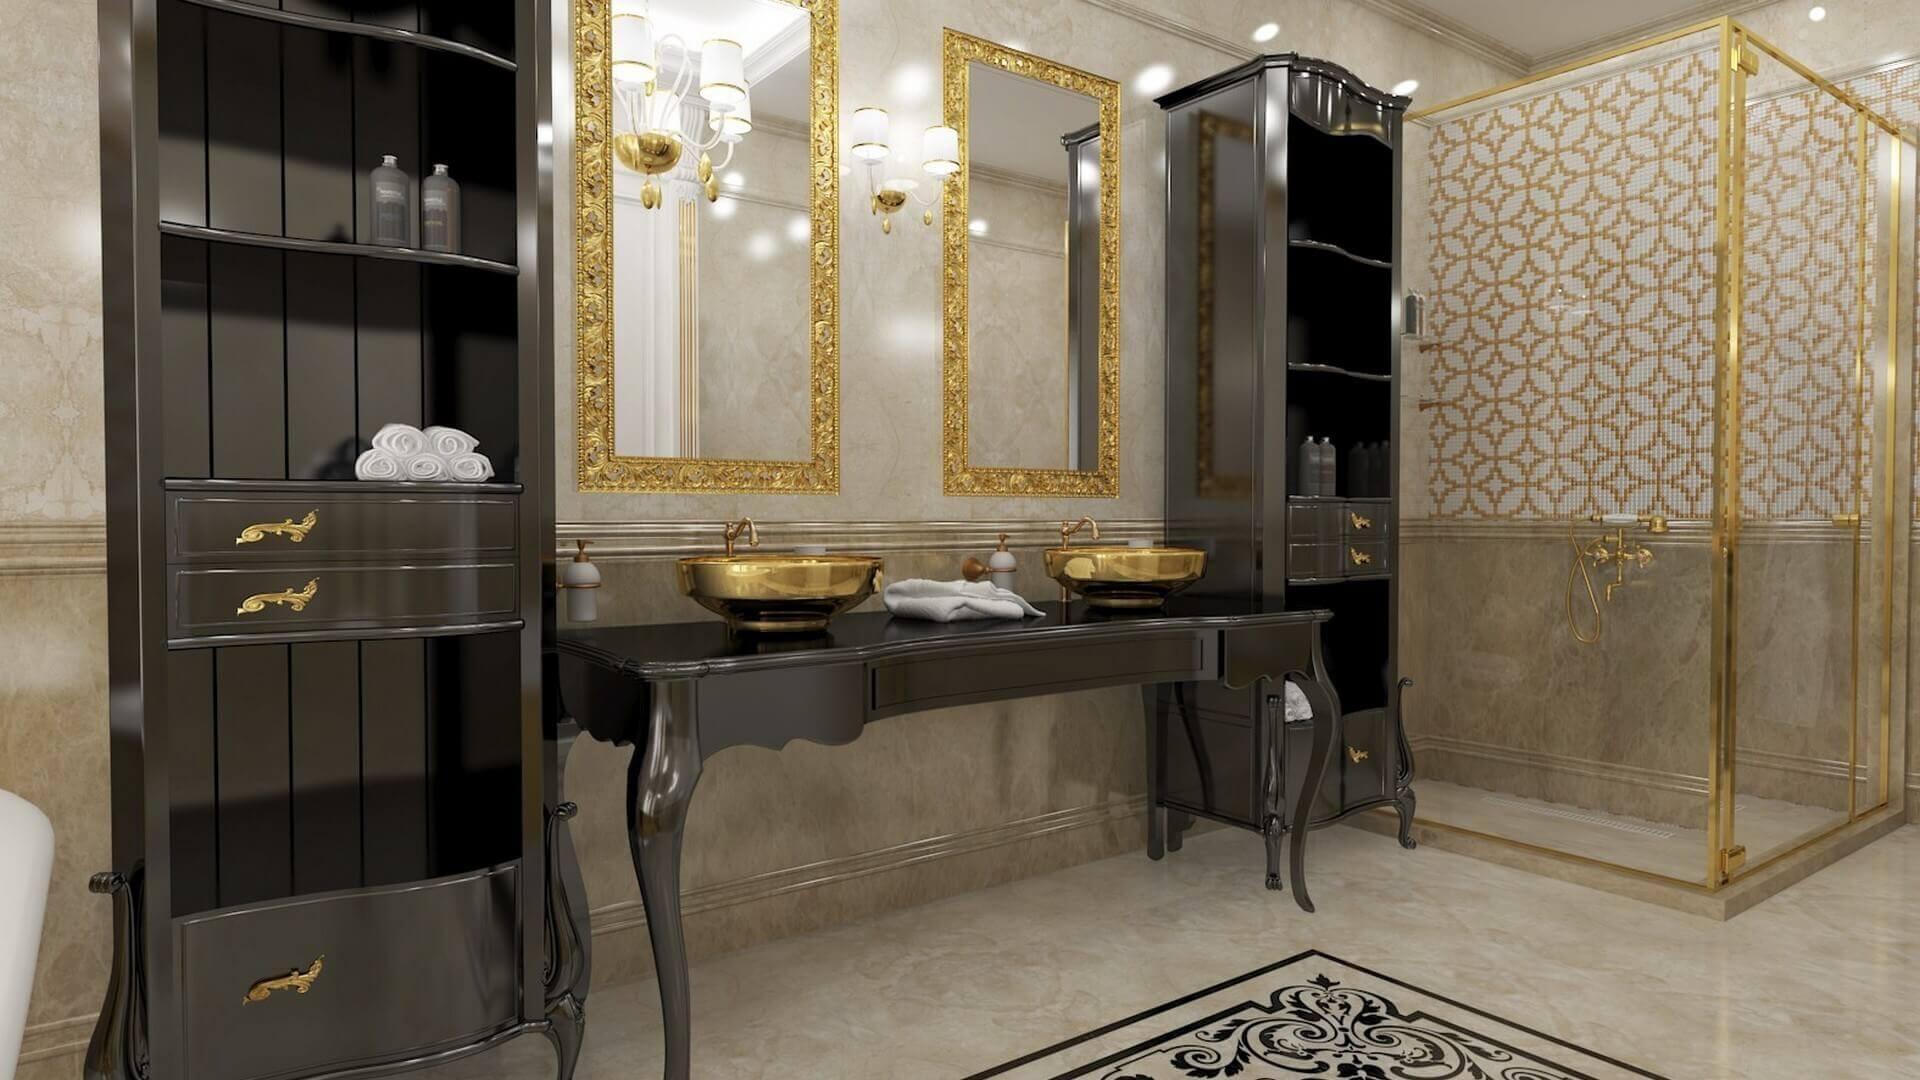 Vantage umitkoy interior designer 2781 Private Project Residential